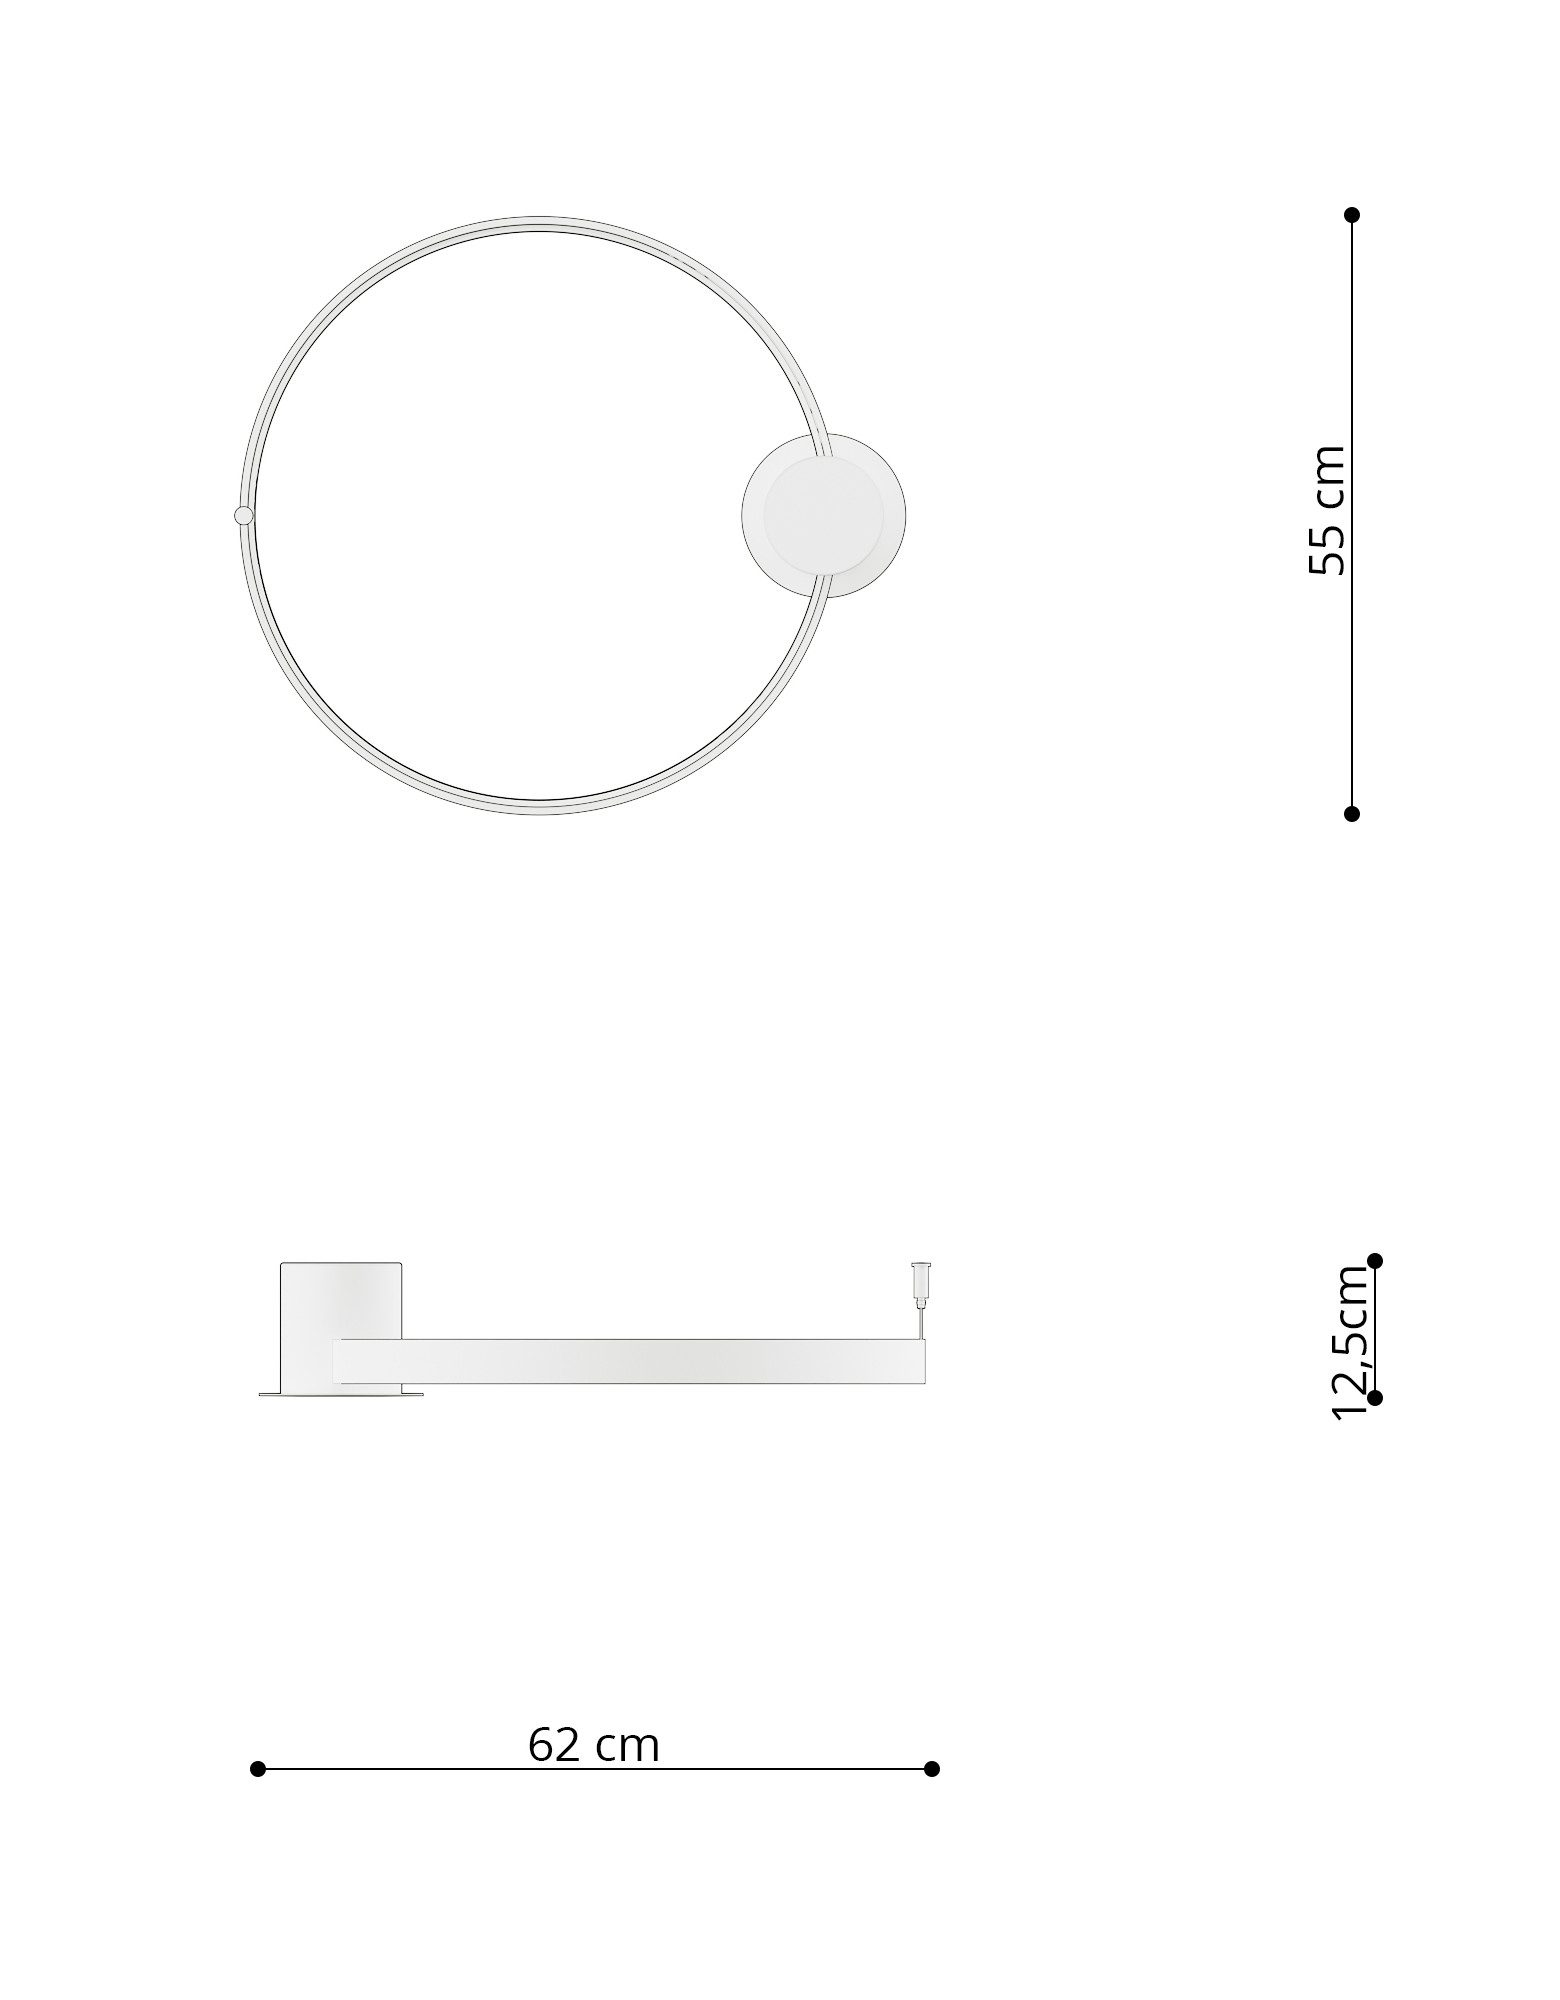 Nowoczesny plafon LED krążek RIO ⌀ 55 cm